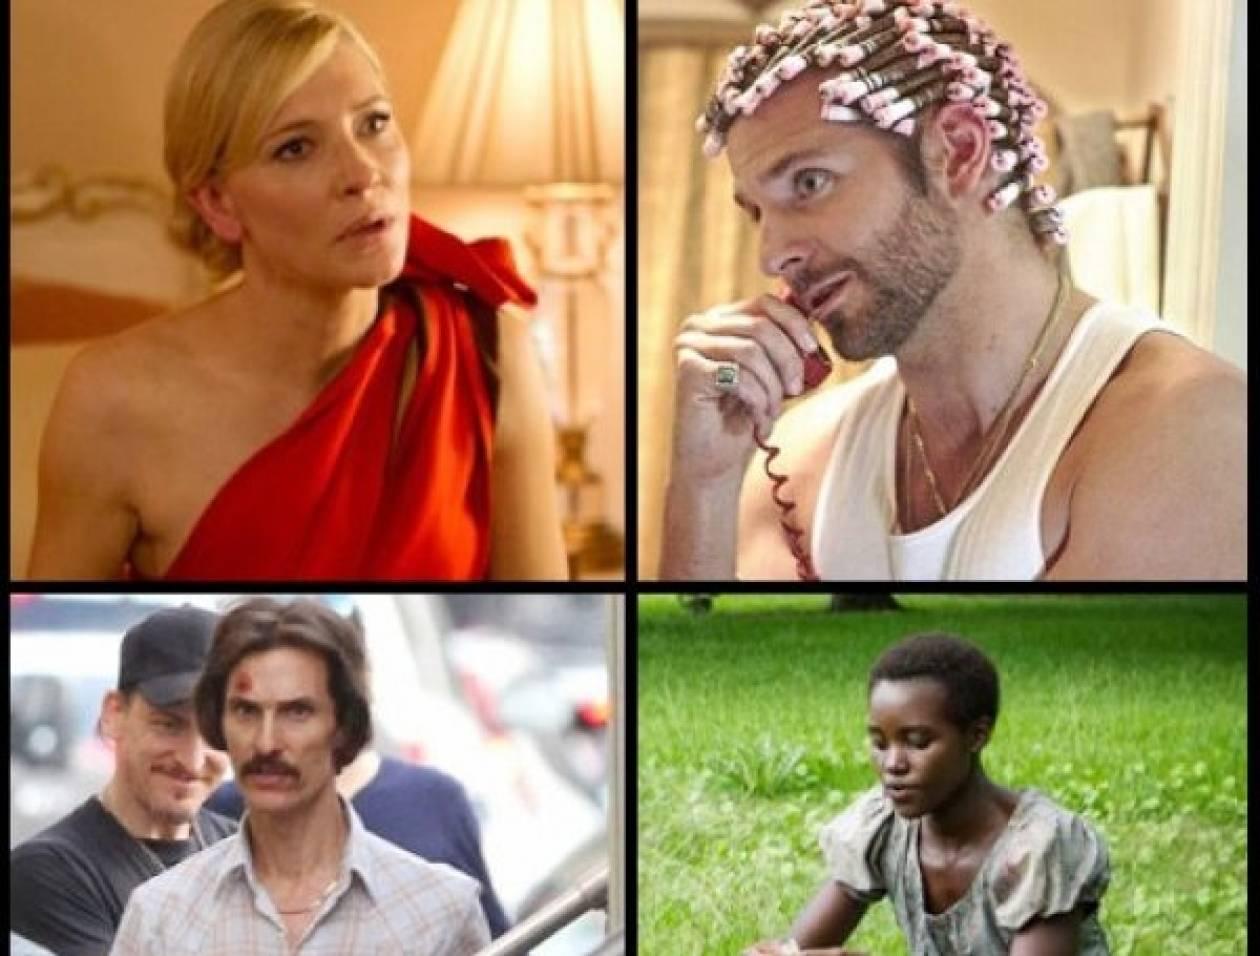 Oscars 2014: Τα προγνωστικά λίγο πριν την μεγάλη απονομή